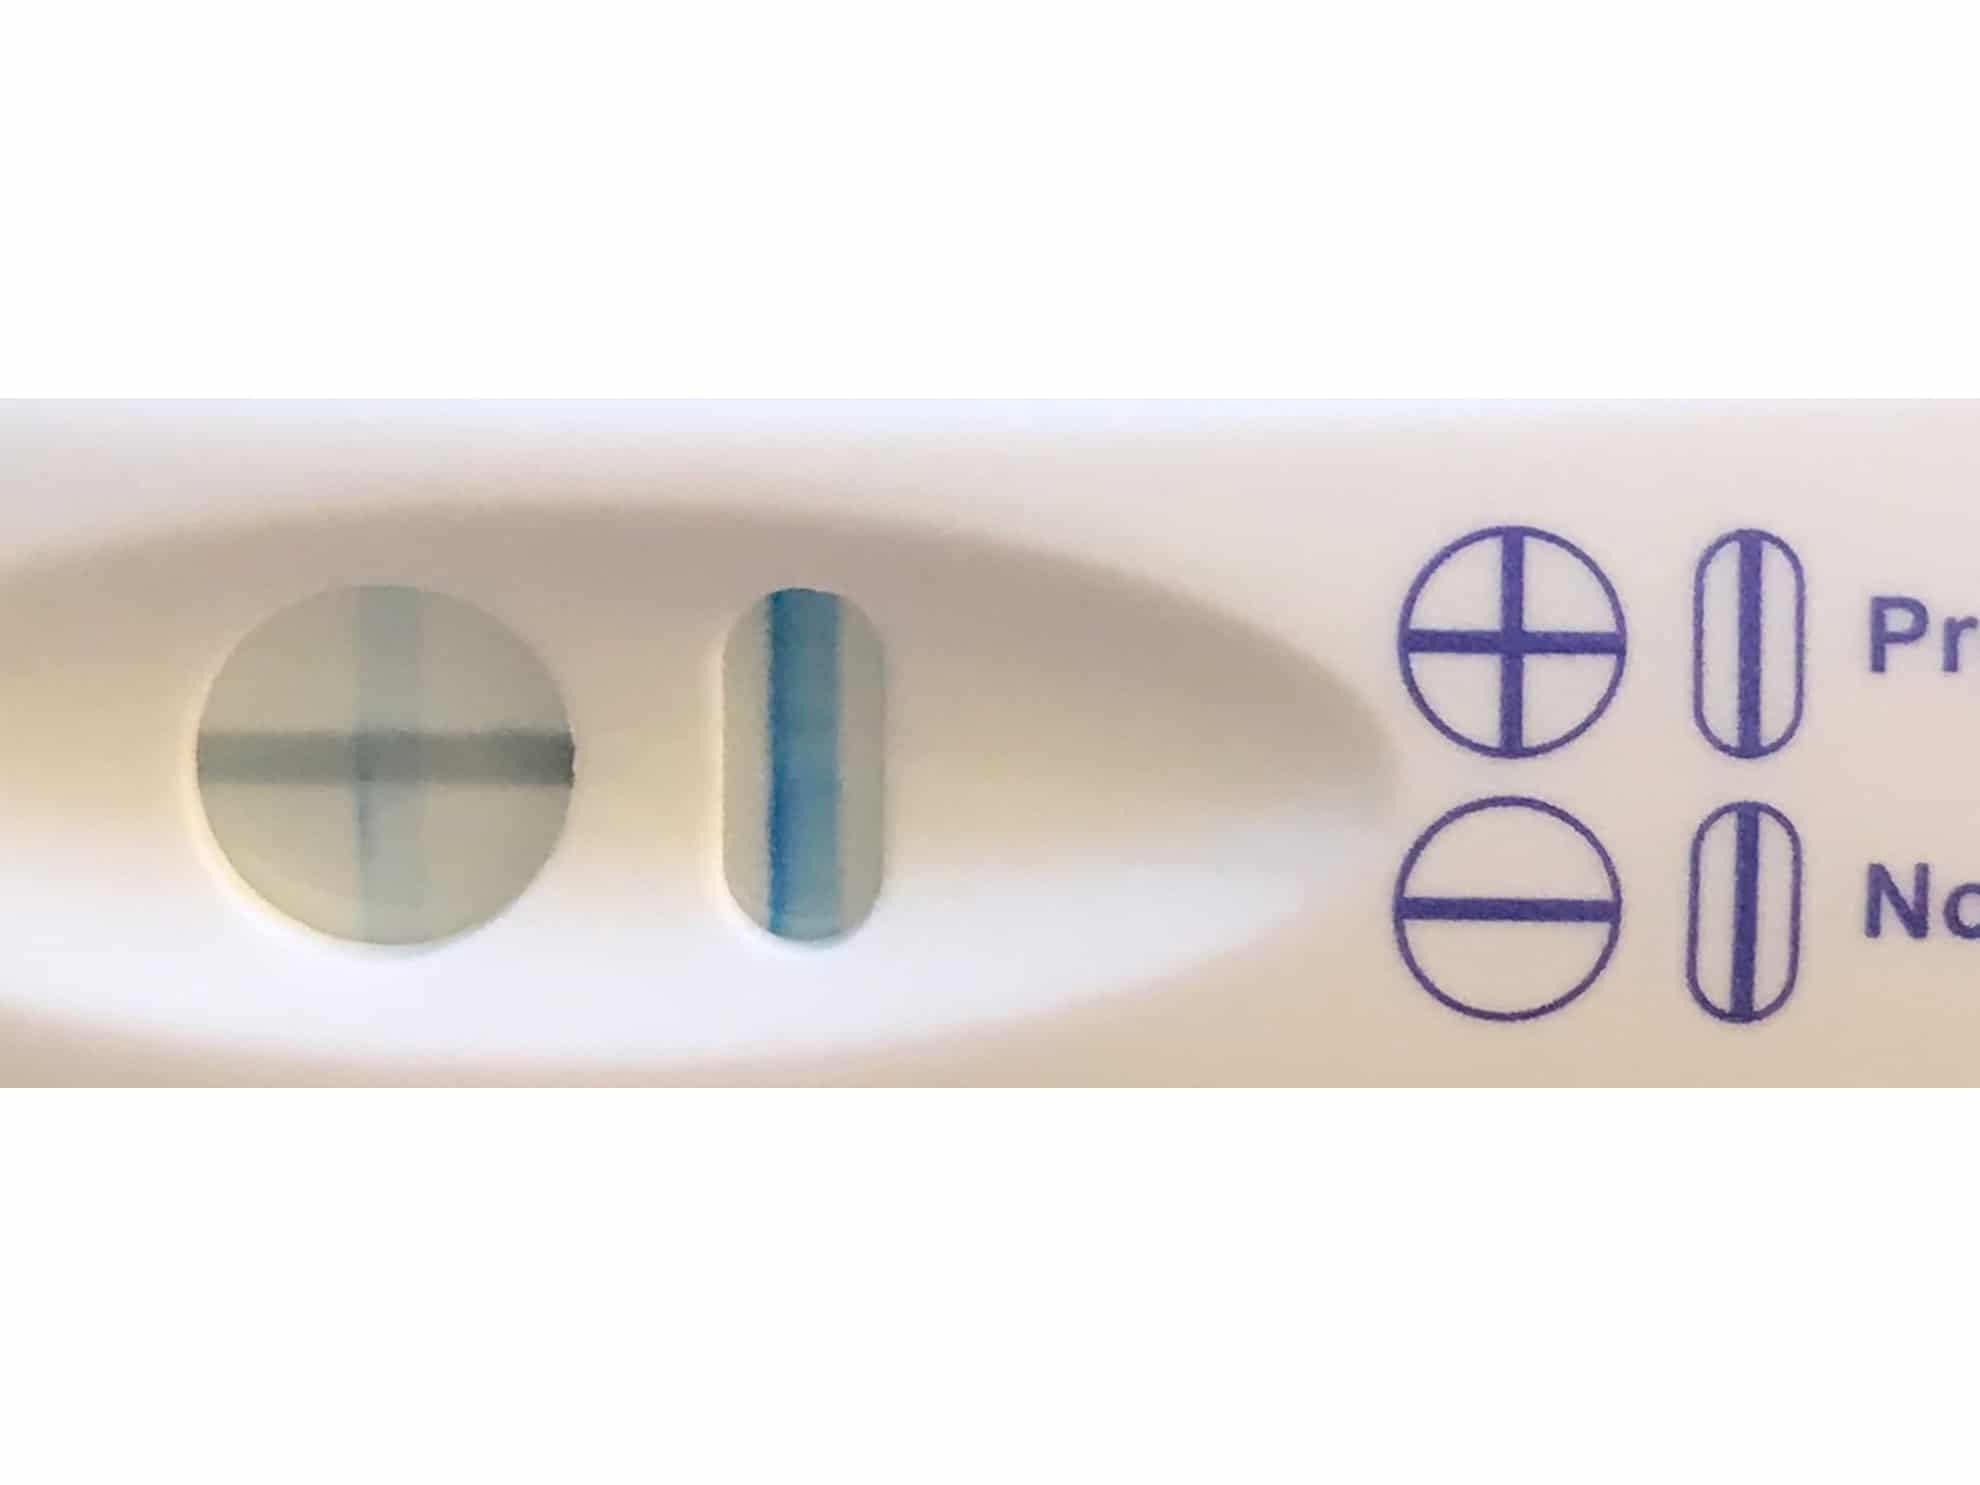 Walgreens Pregnancy Test Faint Line